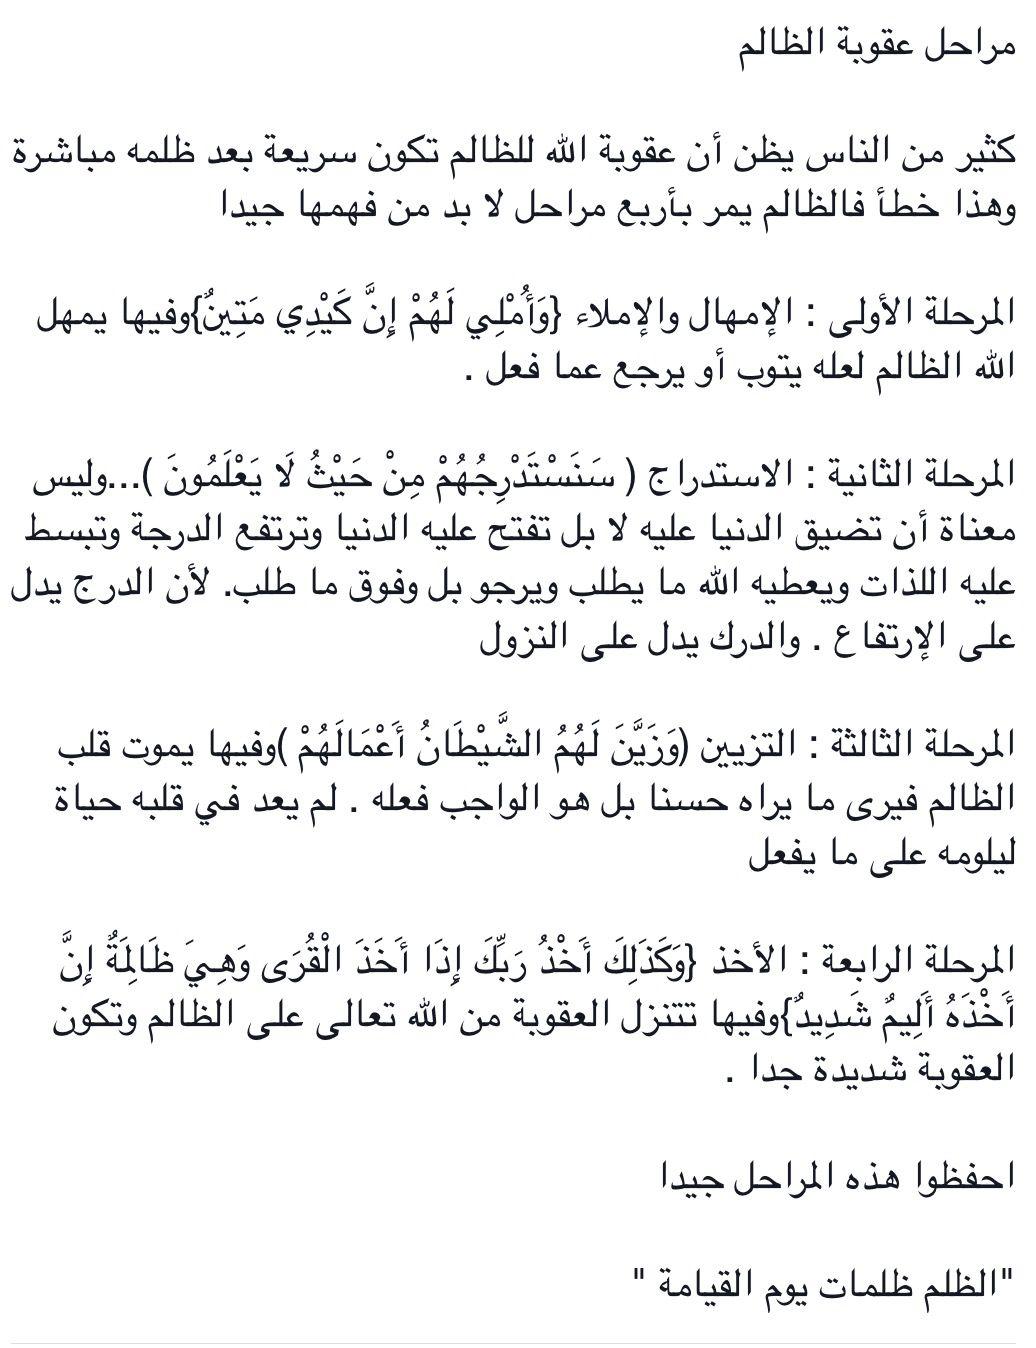 Pin By Karima Ahmed On كلمات Sayings Personality Types Allah